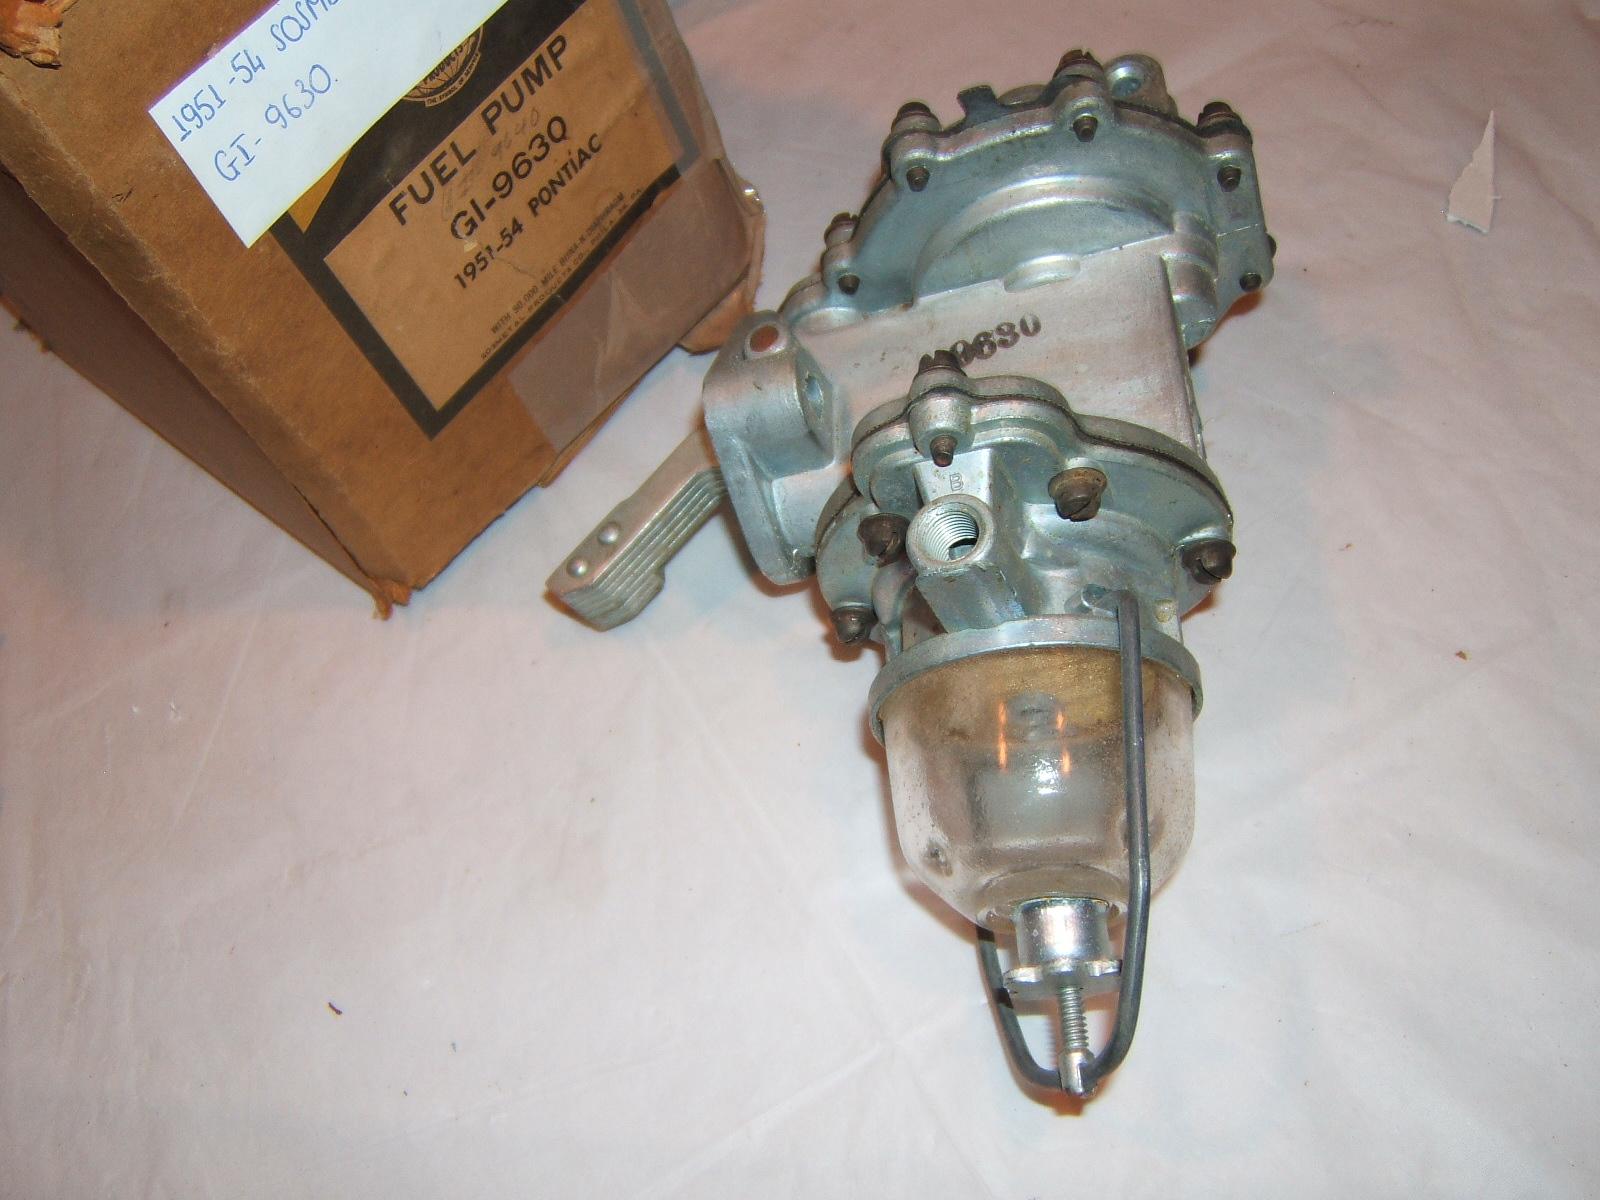 1951 52 53 54 Pontiac Double action fuel pump #9630 (a 9630w sosmetal)